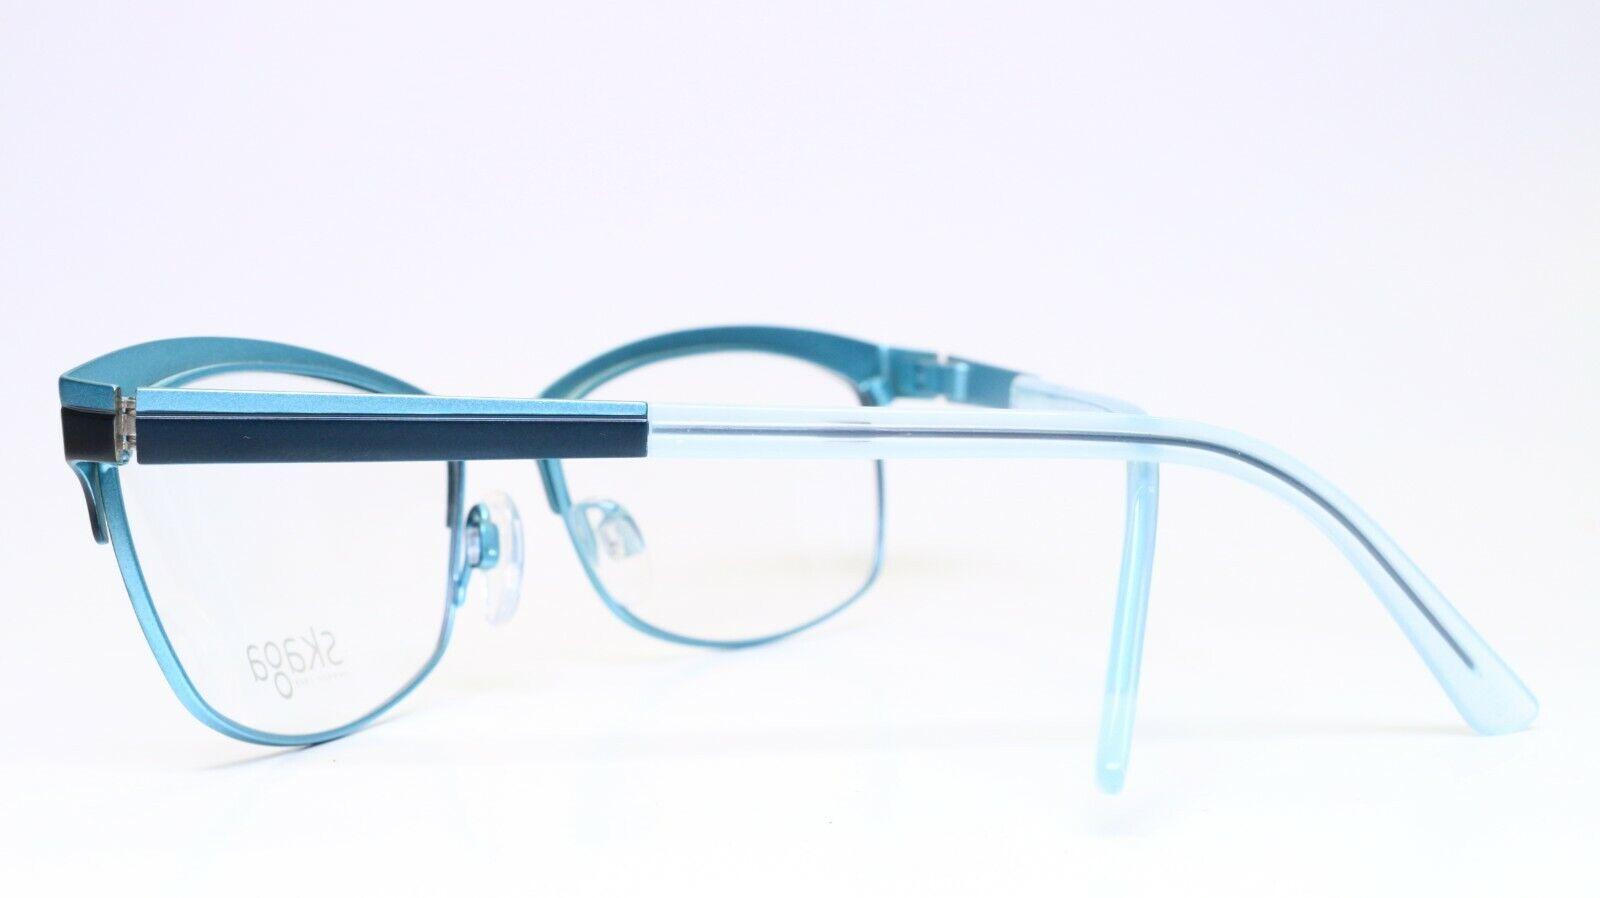 Eyeglasses SKAGA SK 2784 RAKET 424 BLUE